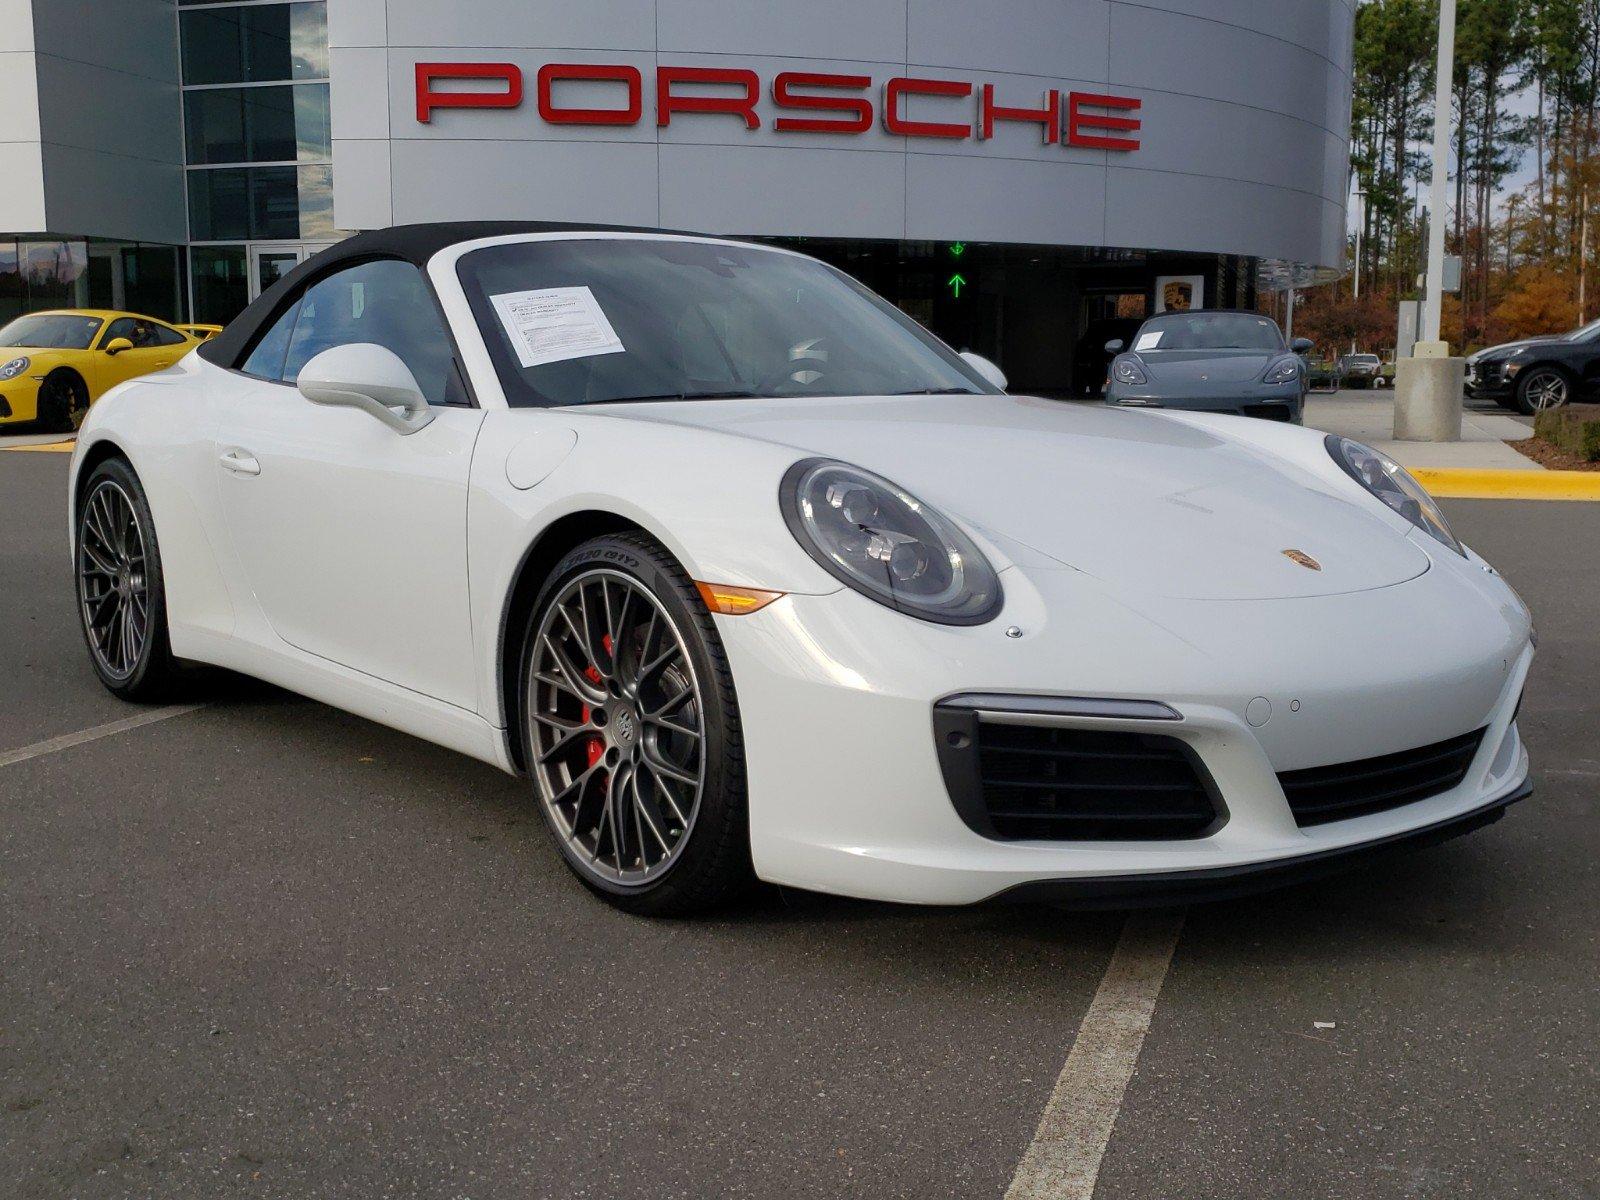 Pre-Owned 2017 Porsche 911 Carrera S Cabriolet